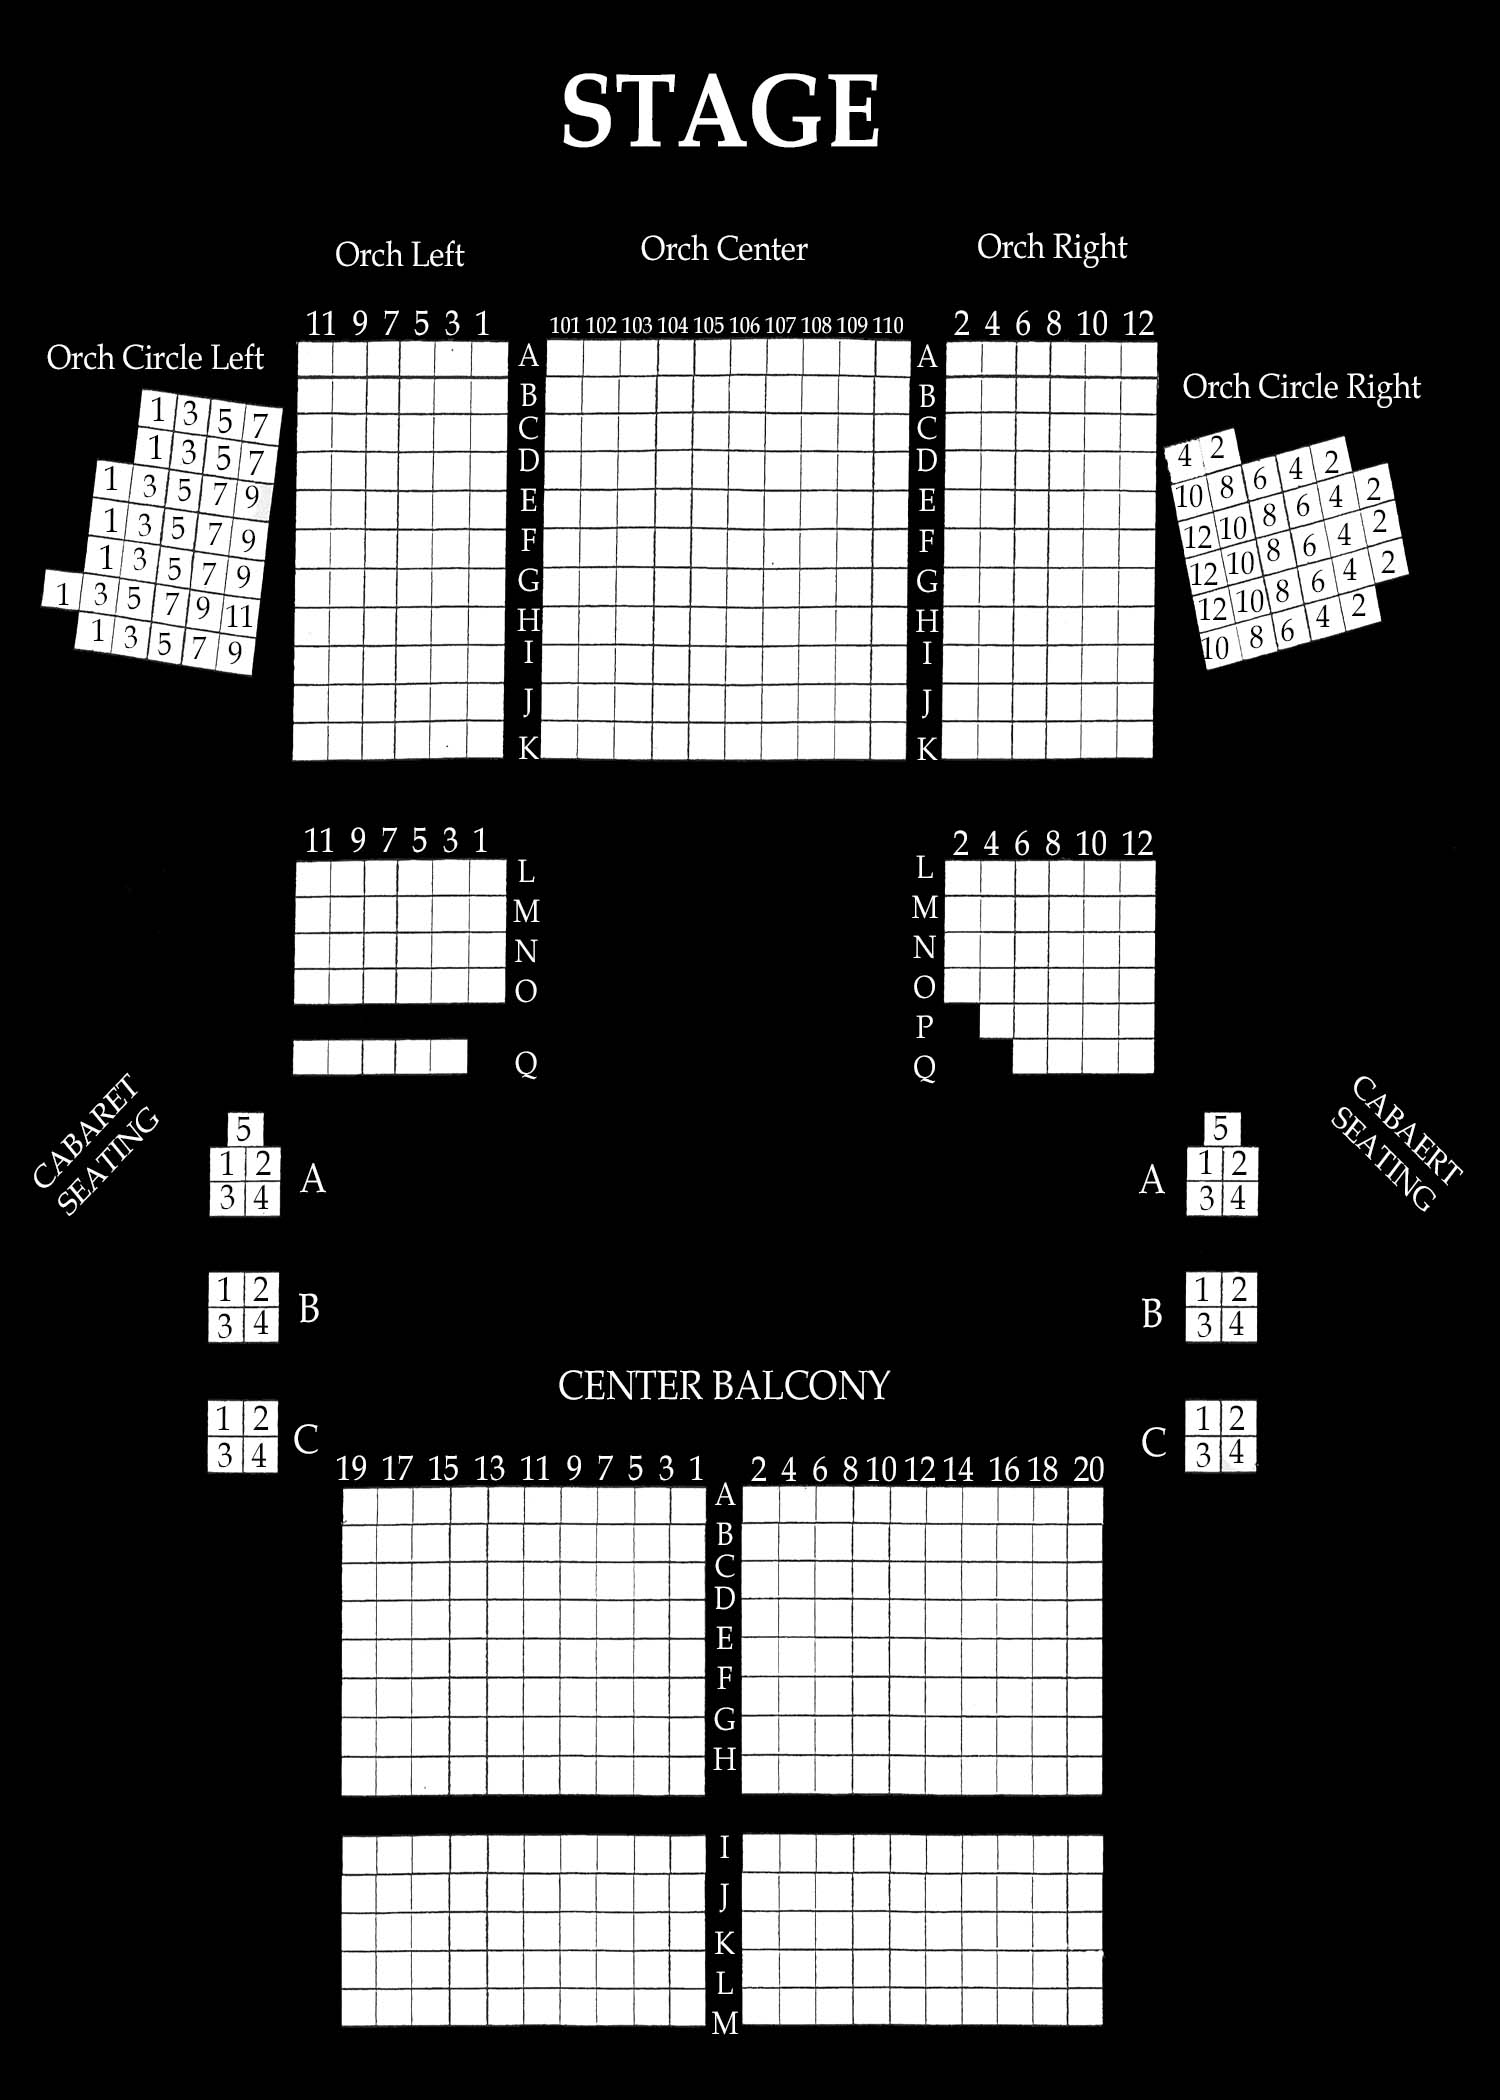 Seating ChartSMALL.jpg